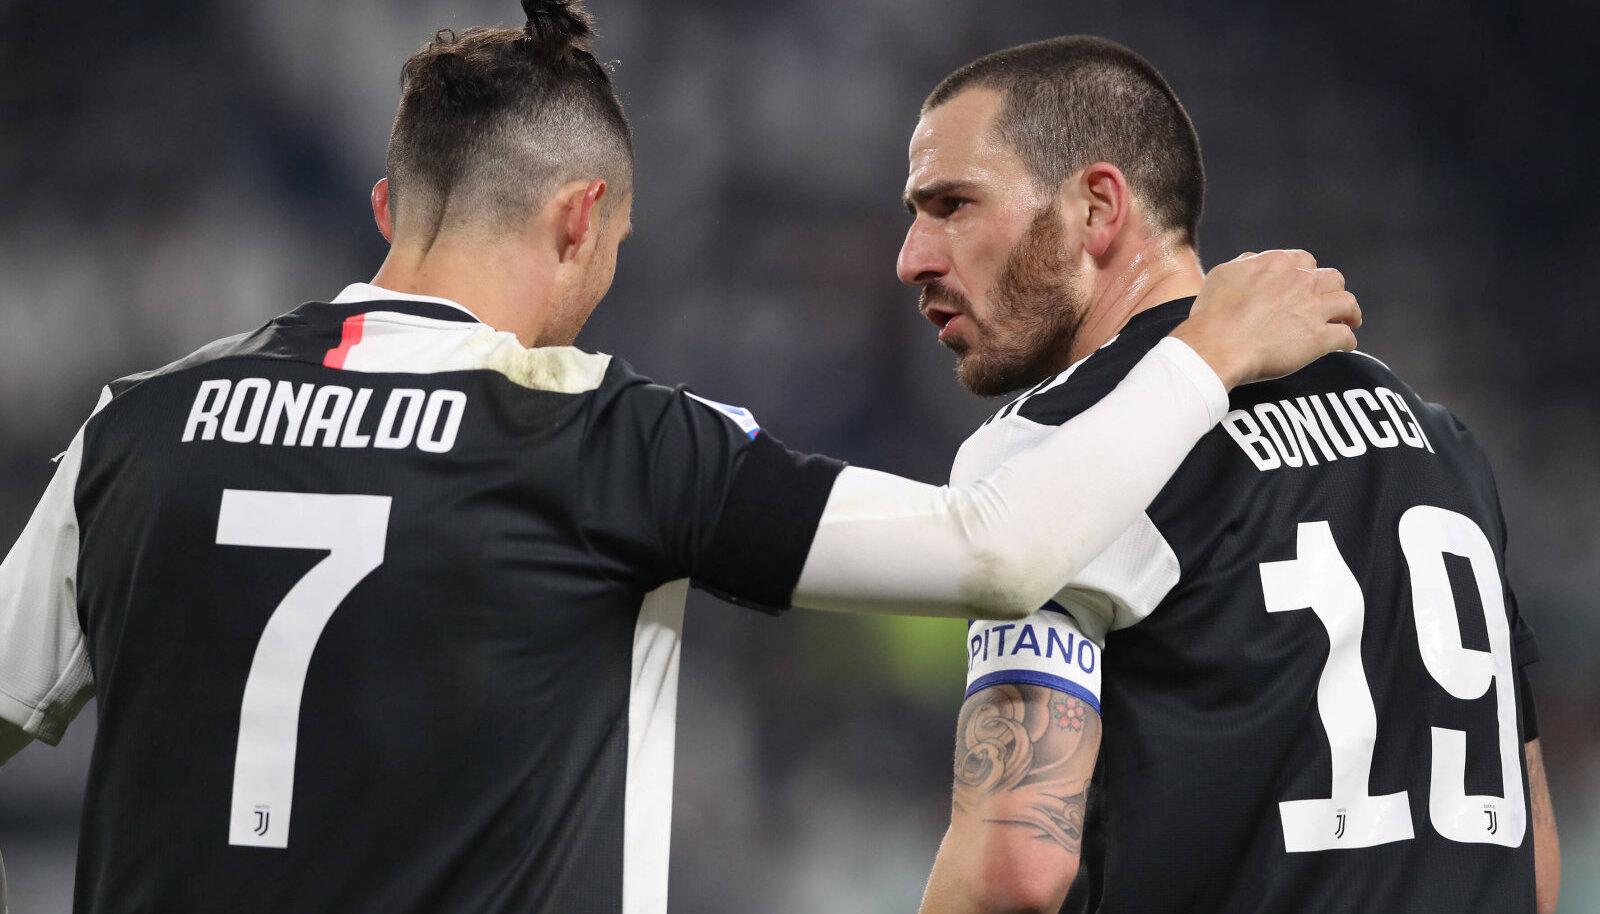 Cristiano Ronaldo ja Leonardo Bonucci